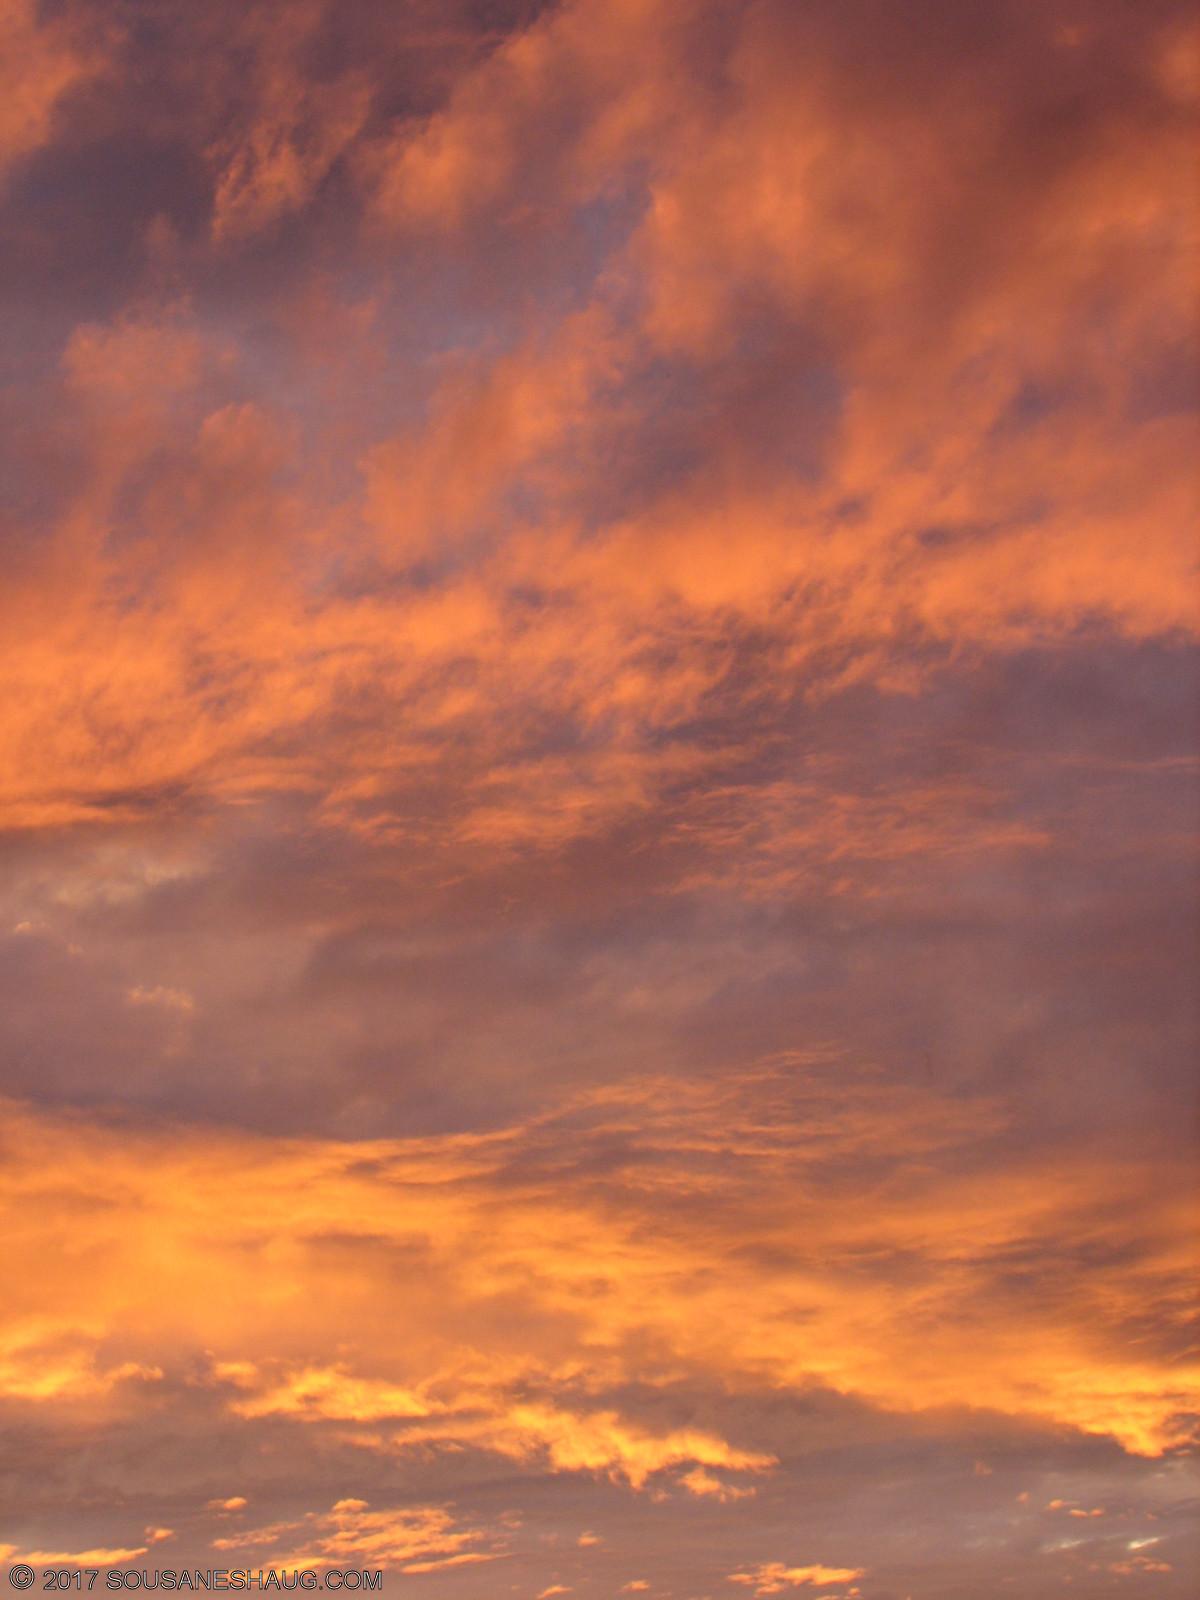 Sunset-sky-on-fire-2